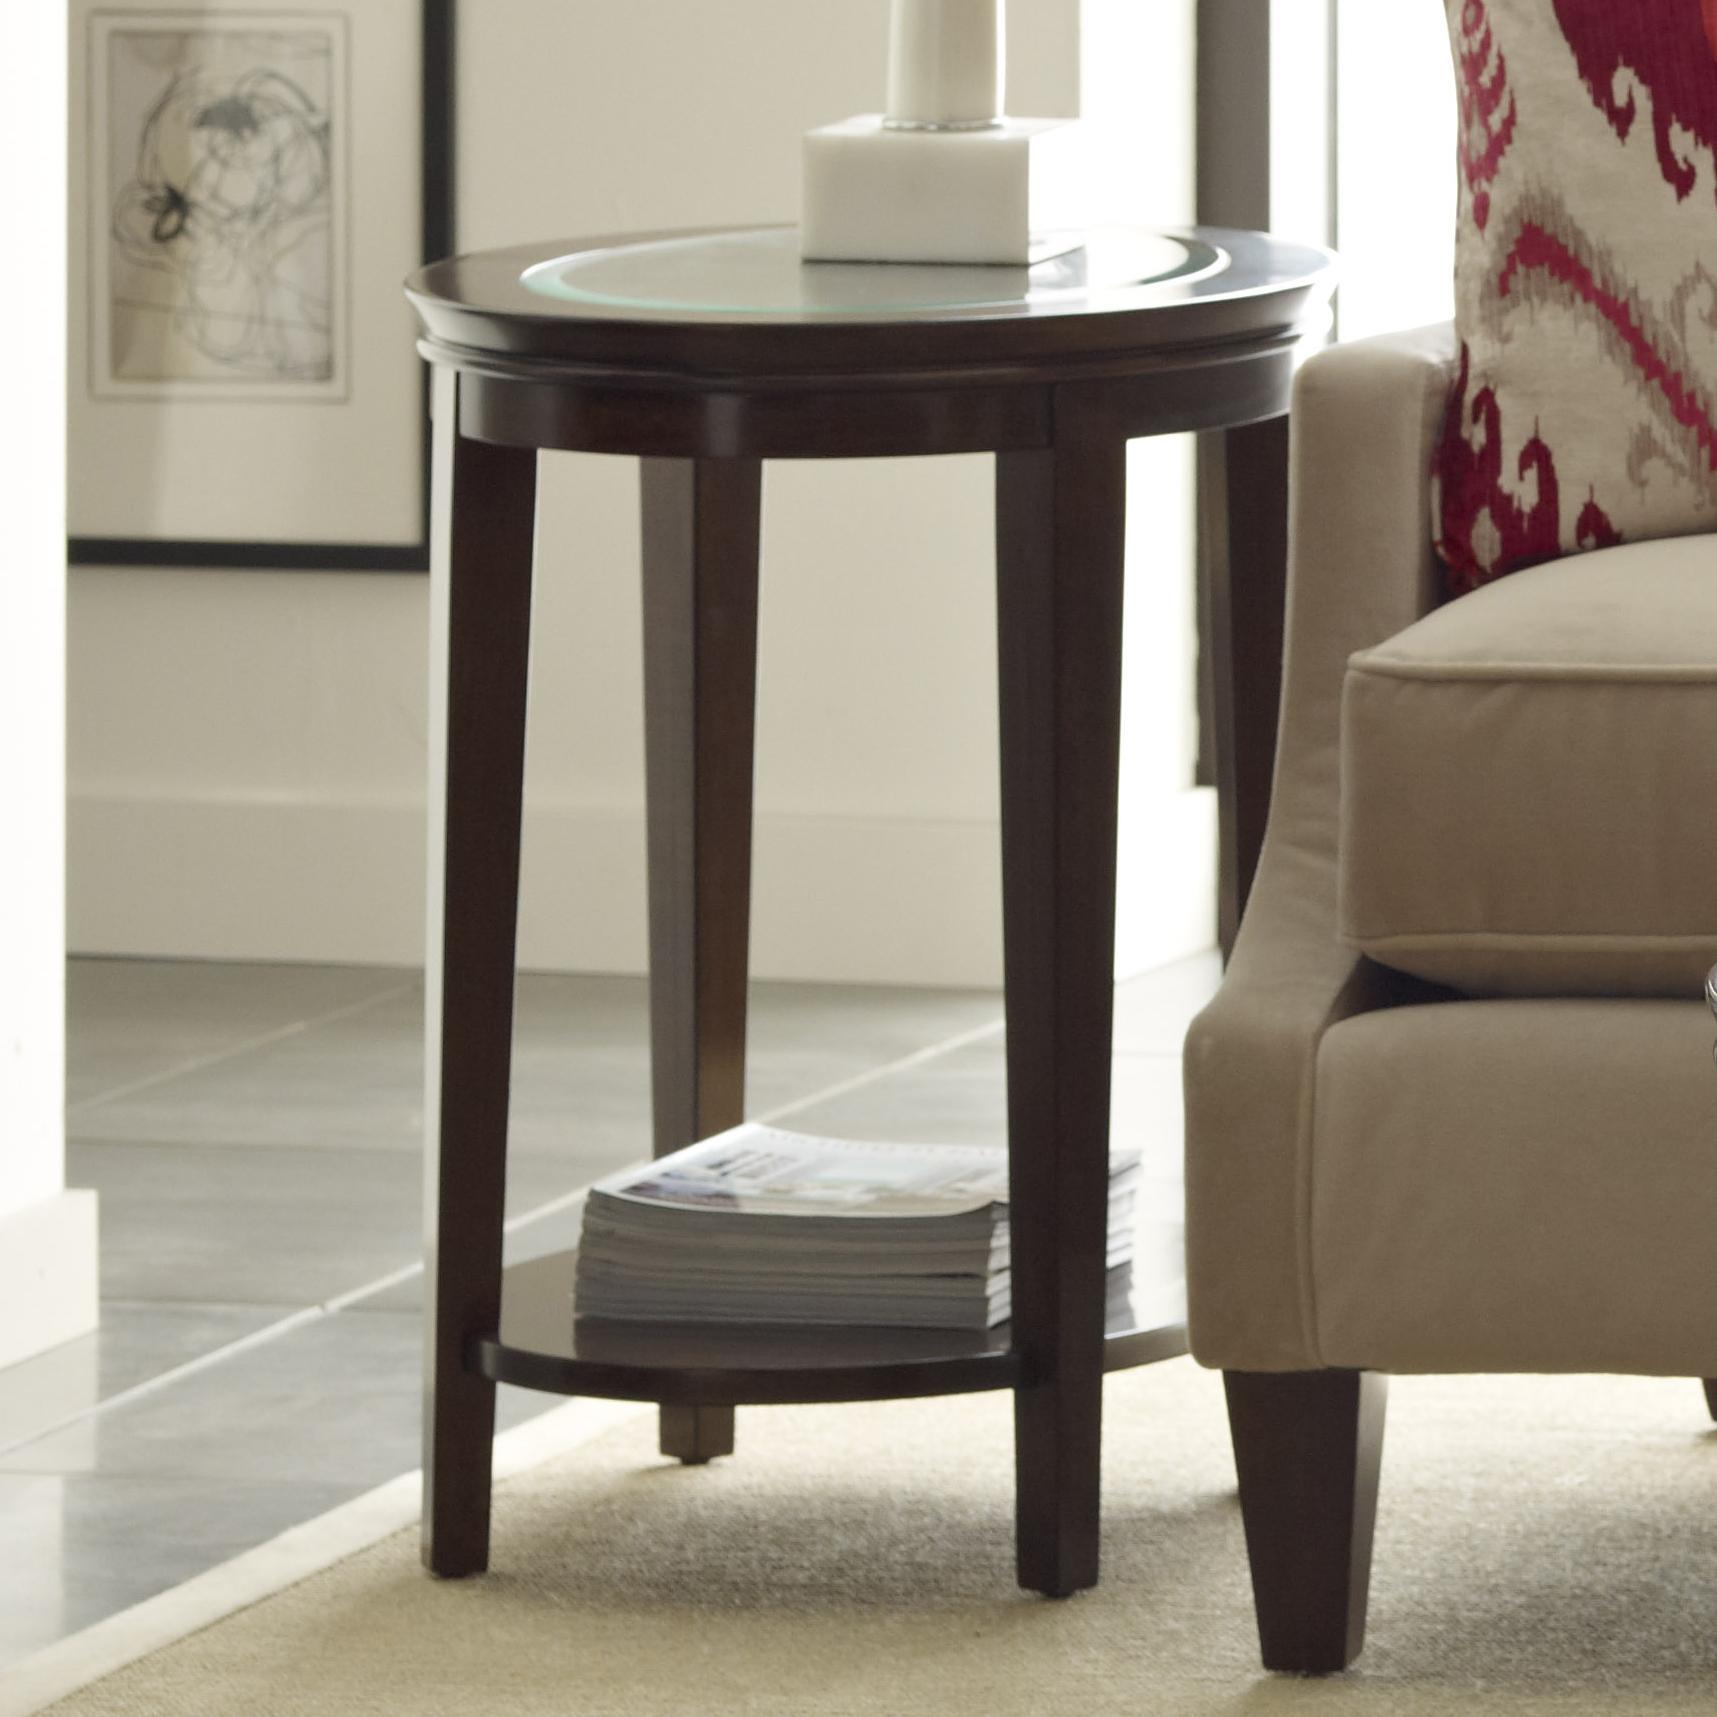 Elise Elise Oval End Table by Kincaid Furniture at Johnny Janosik